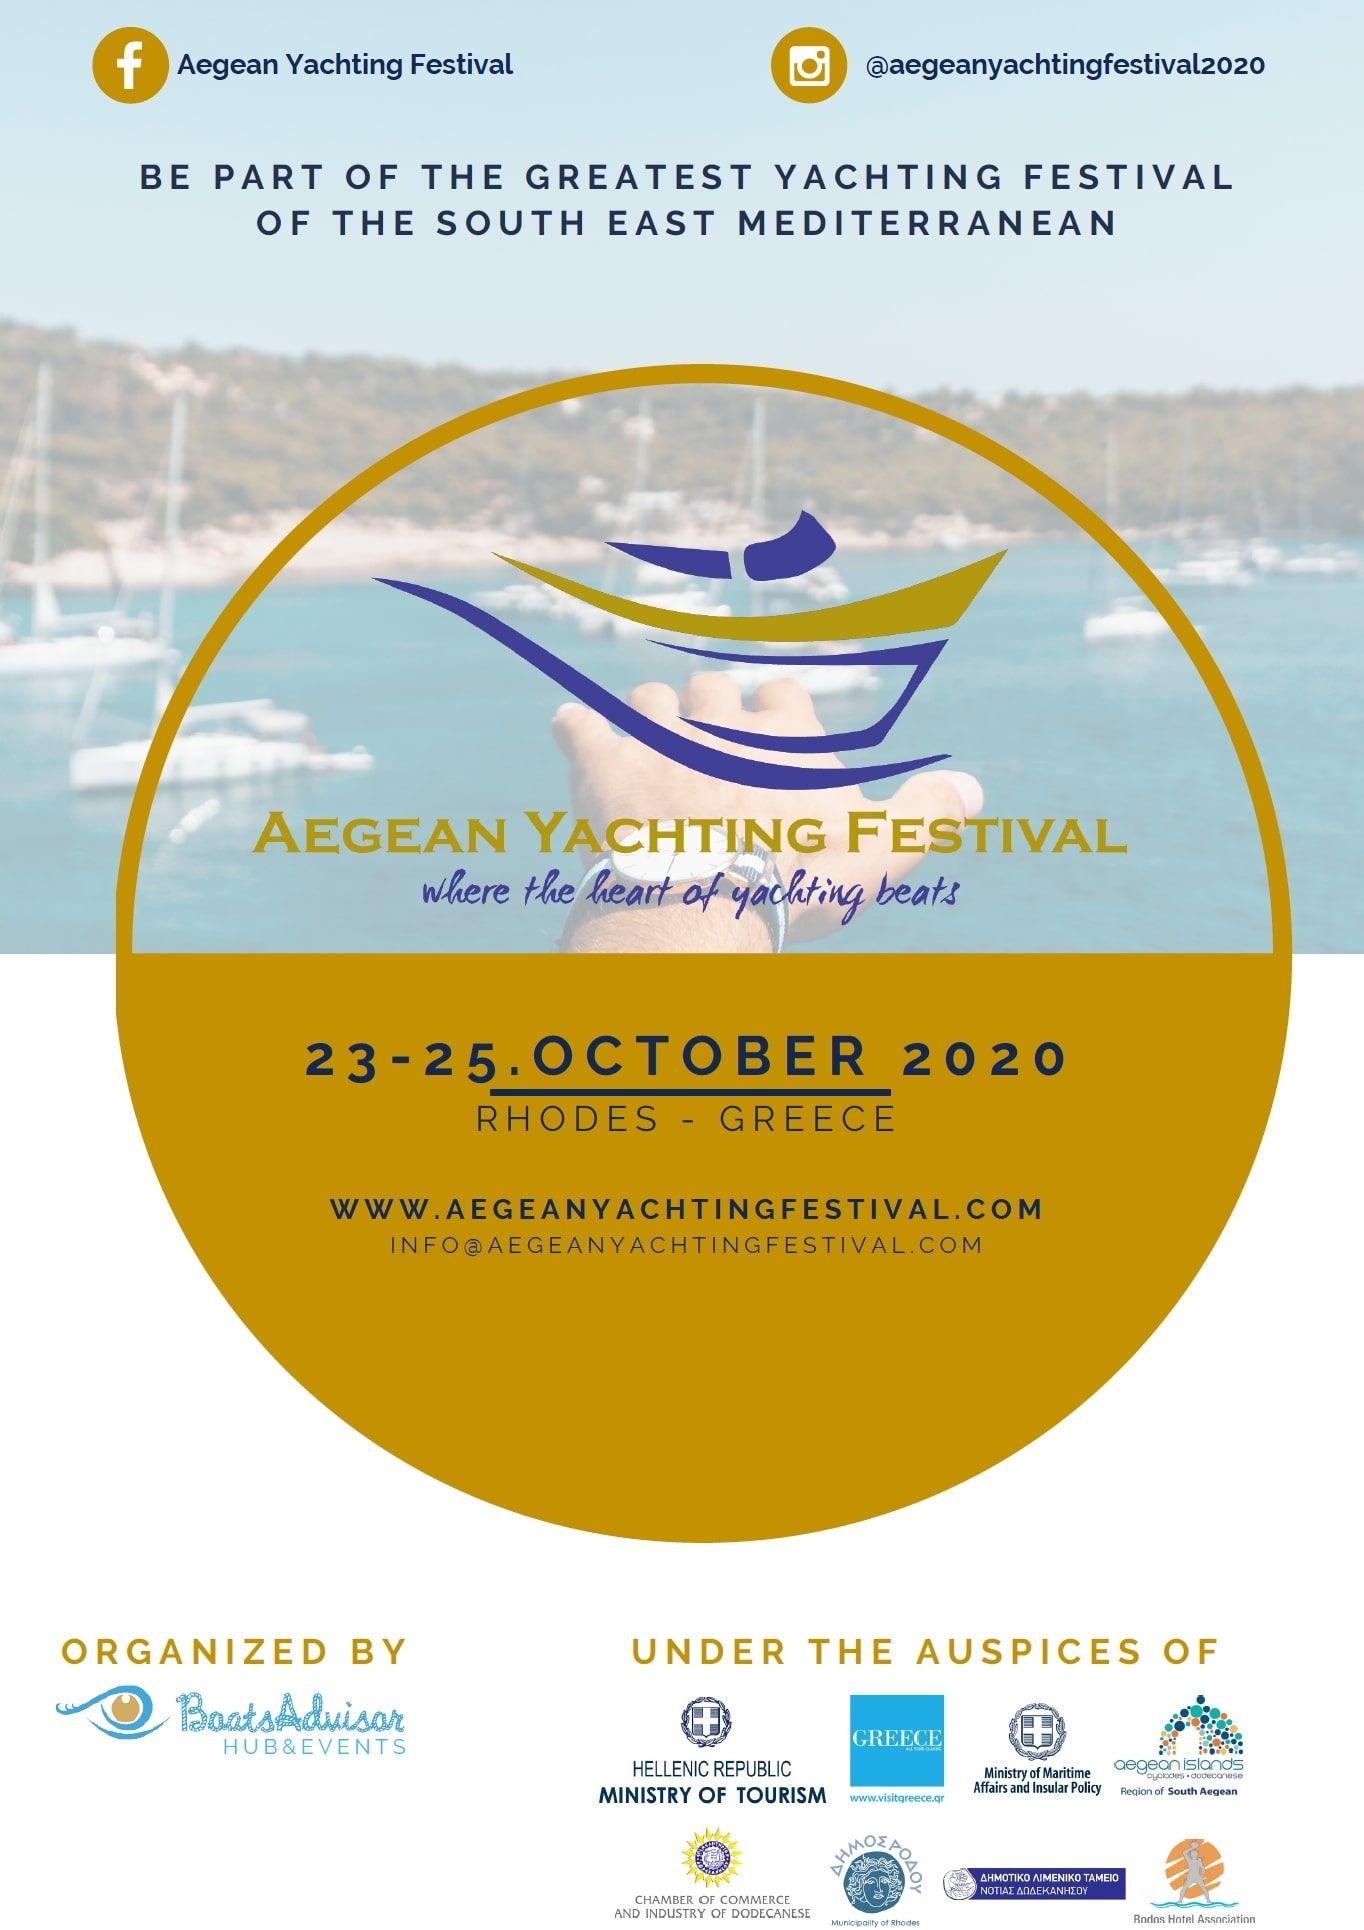 Aegean Yachting Festival: 23 – 25 October 2020 (Greece)